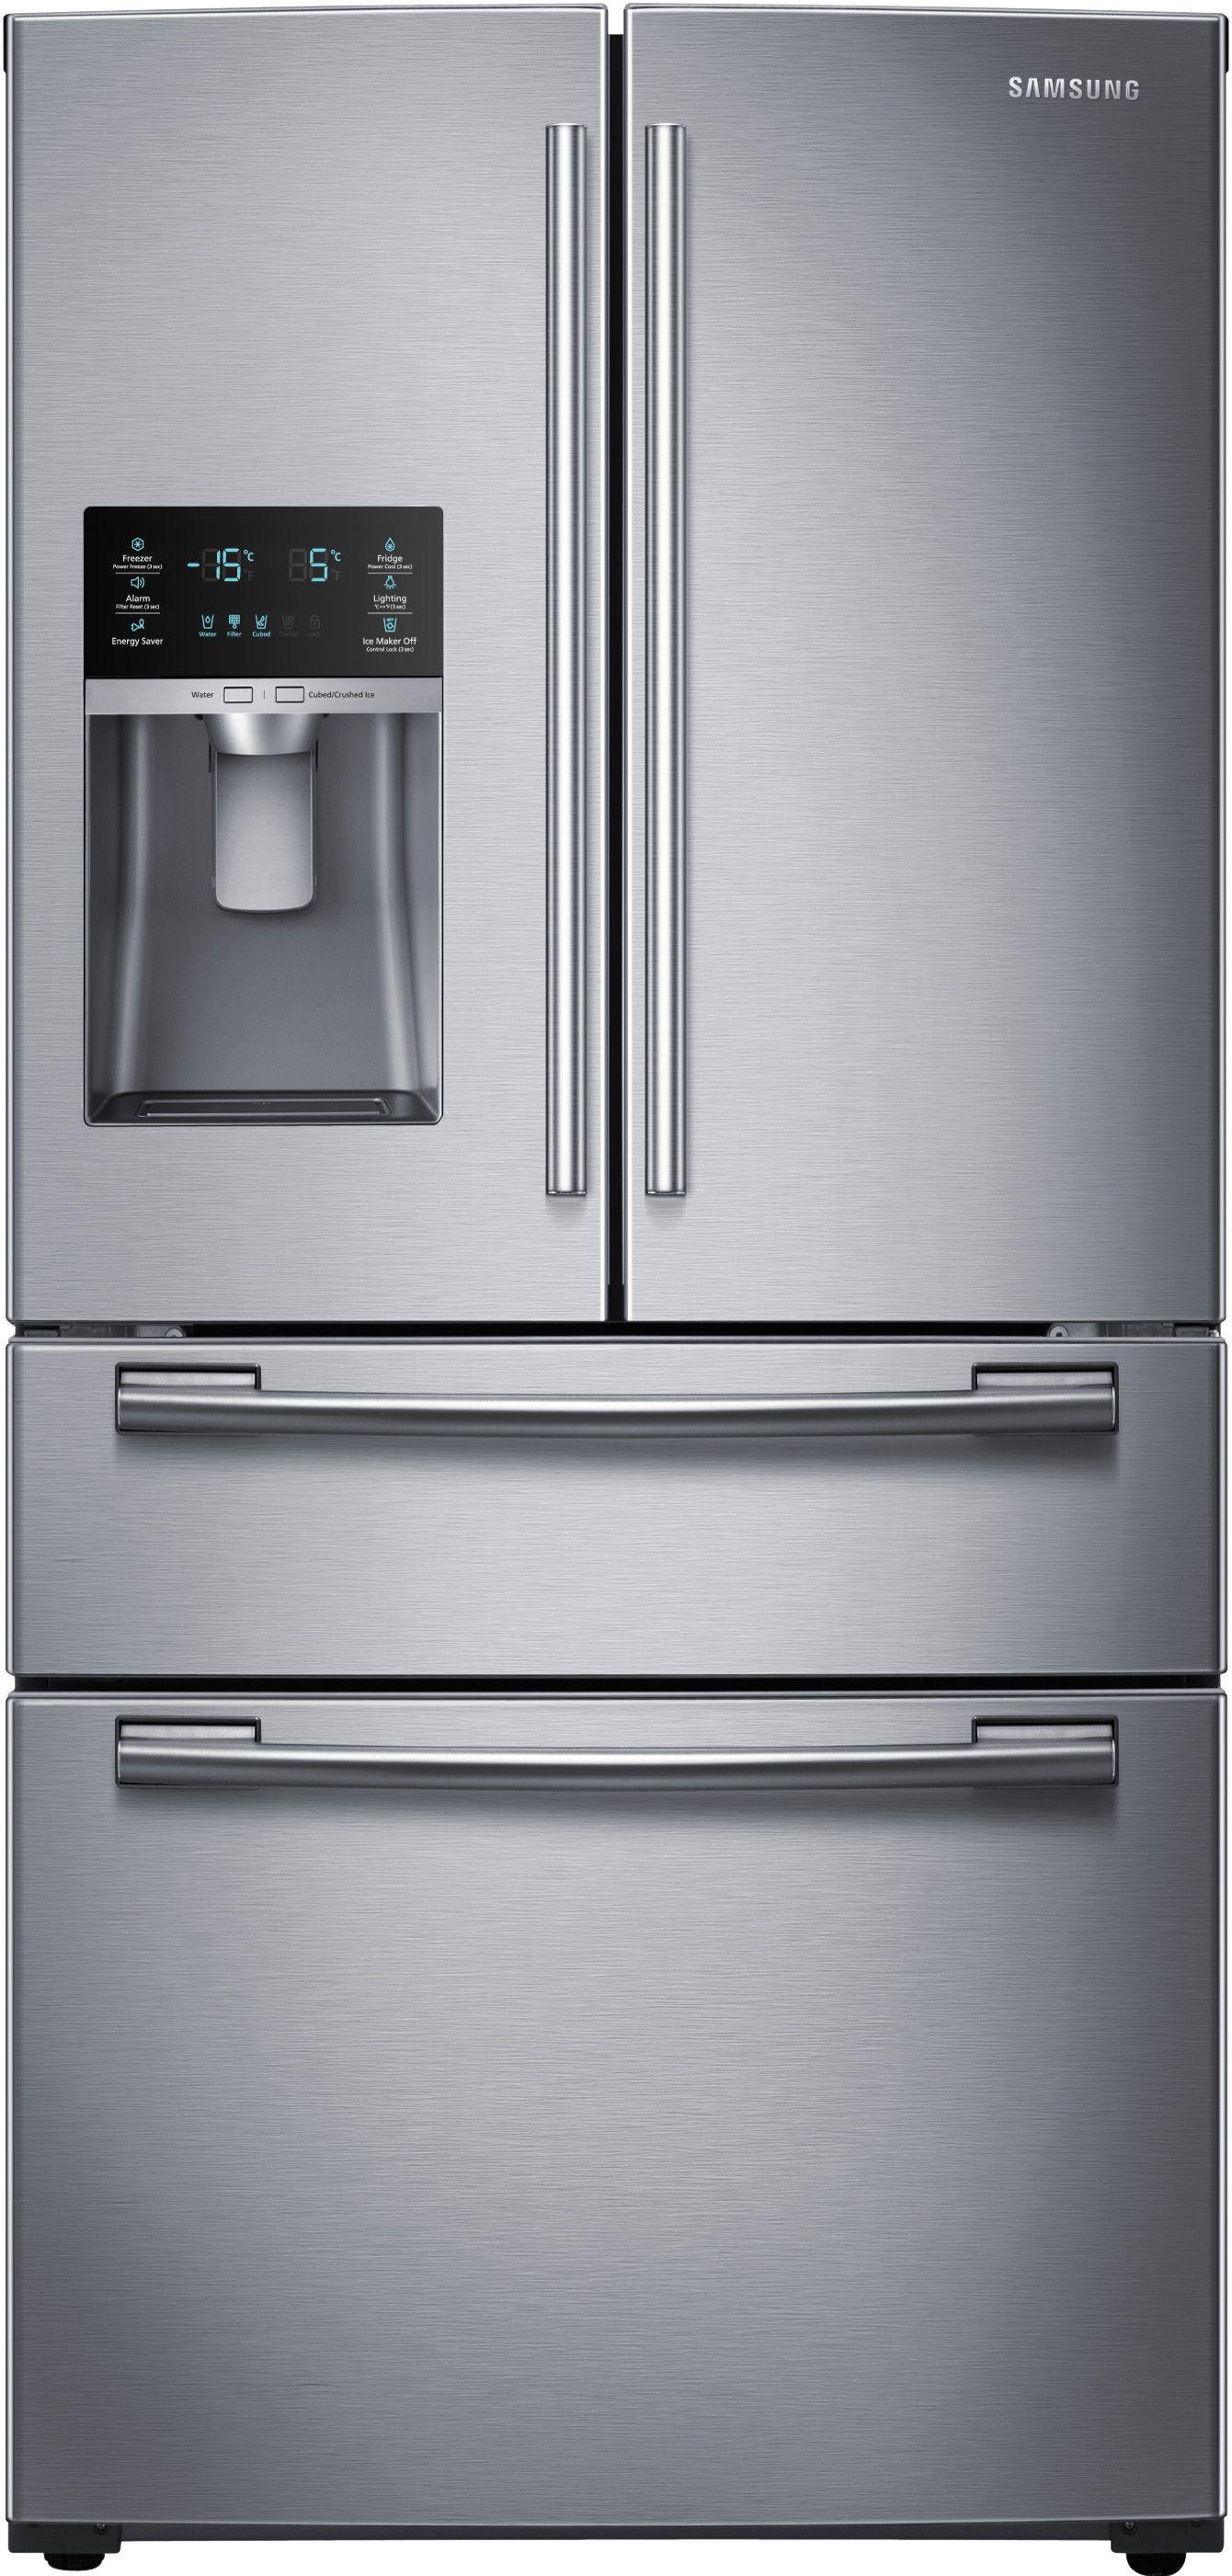 Samsung Rf25hmedbsr In 2020 French Door Refrigerator French